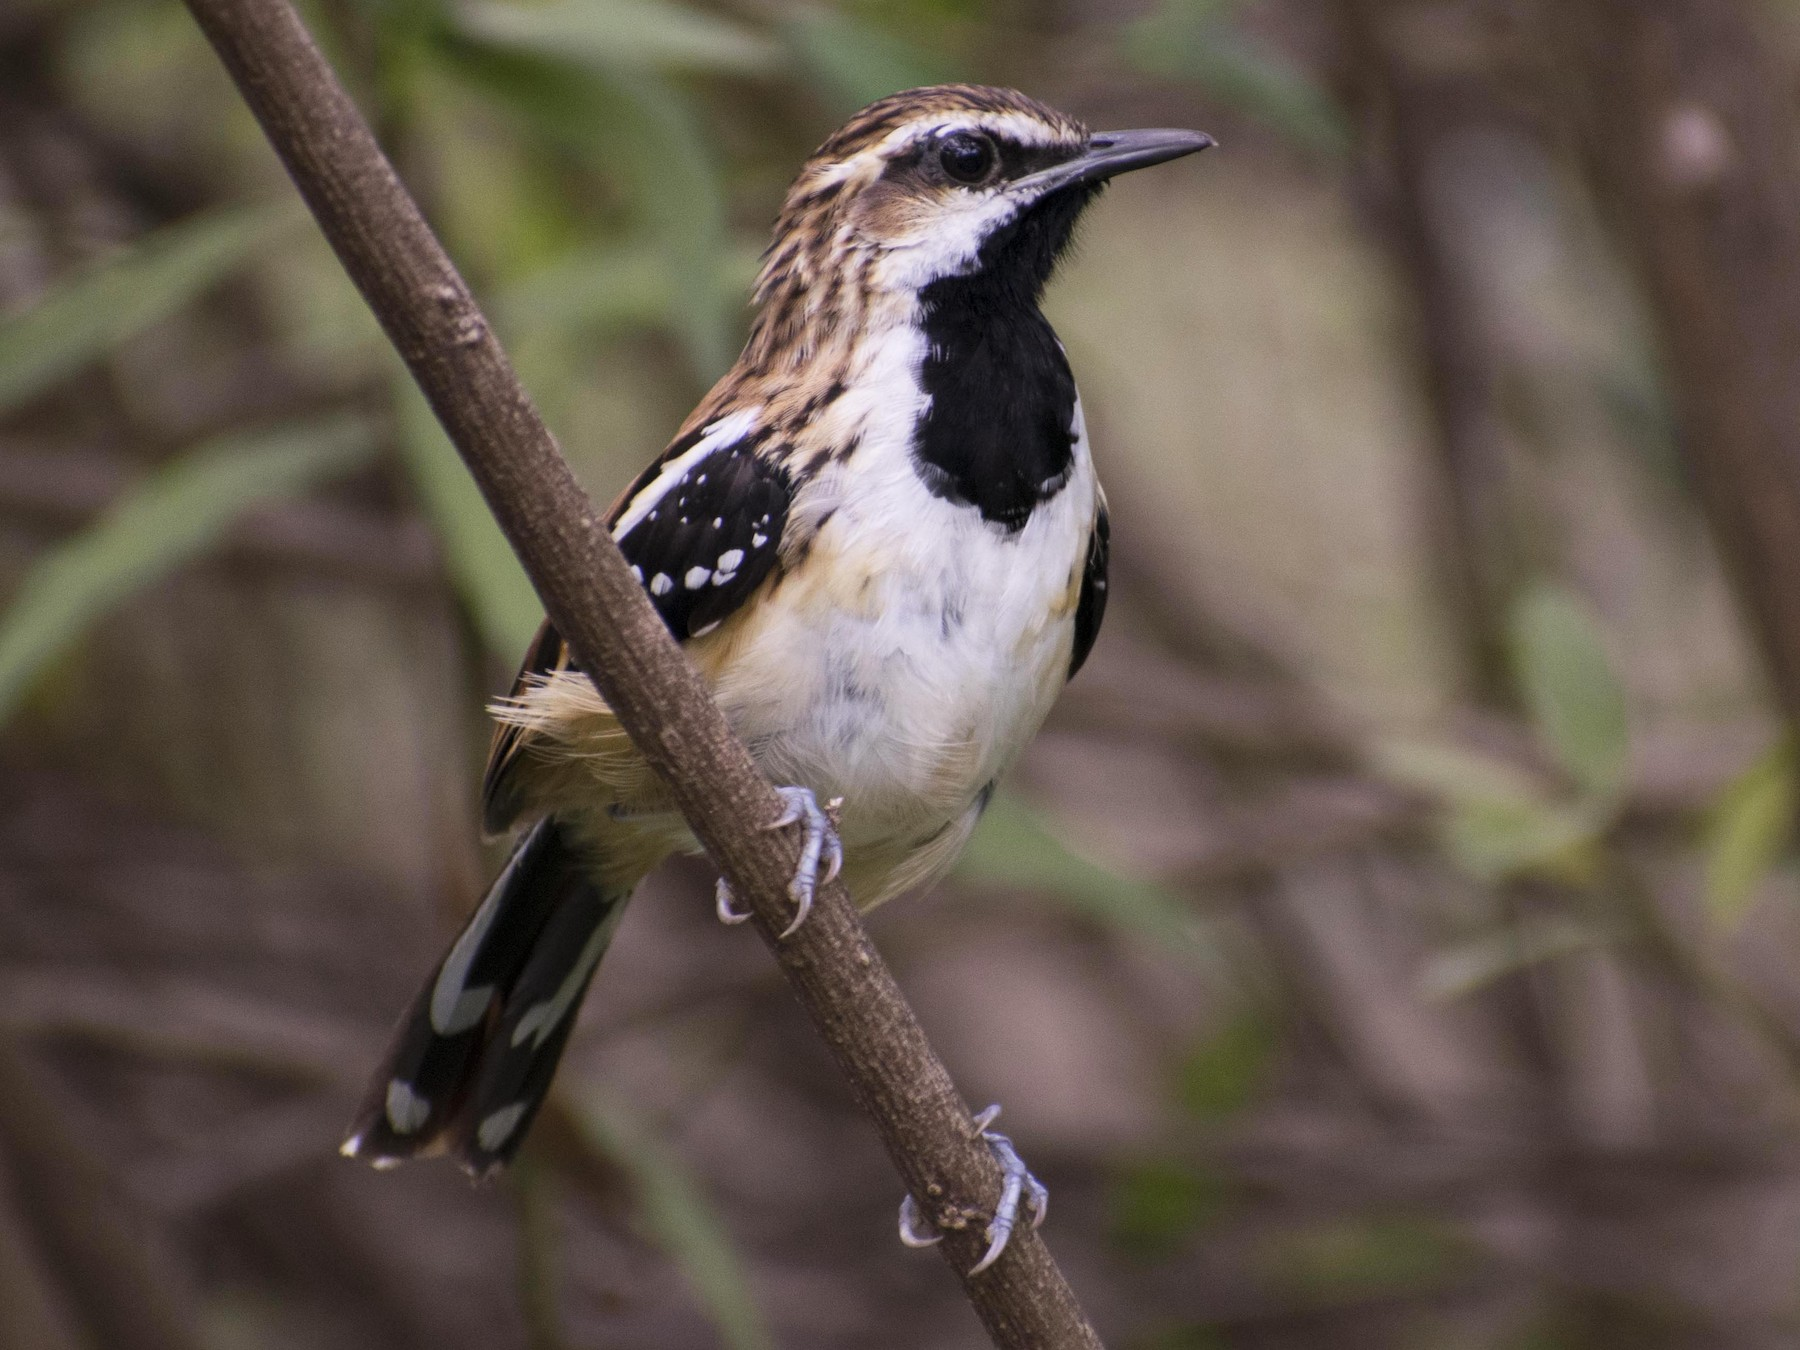 Stripe-backed Antbird - Leandro Bareiro Guiñazú